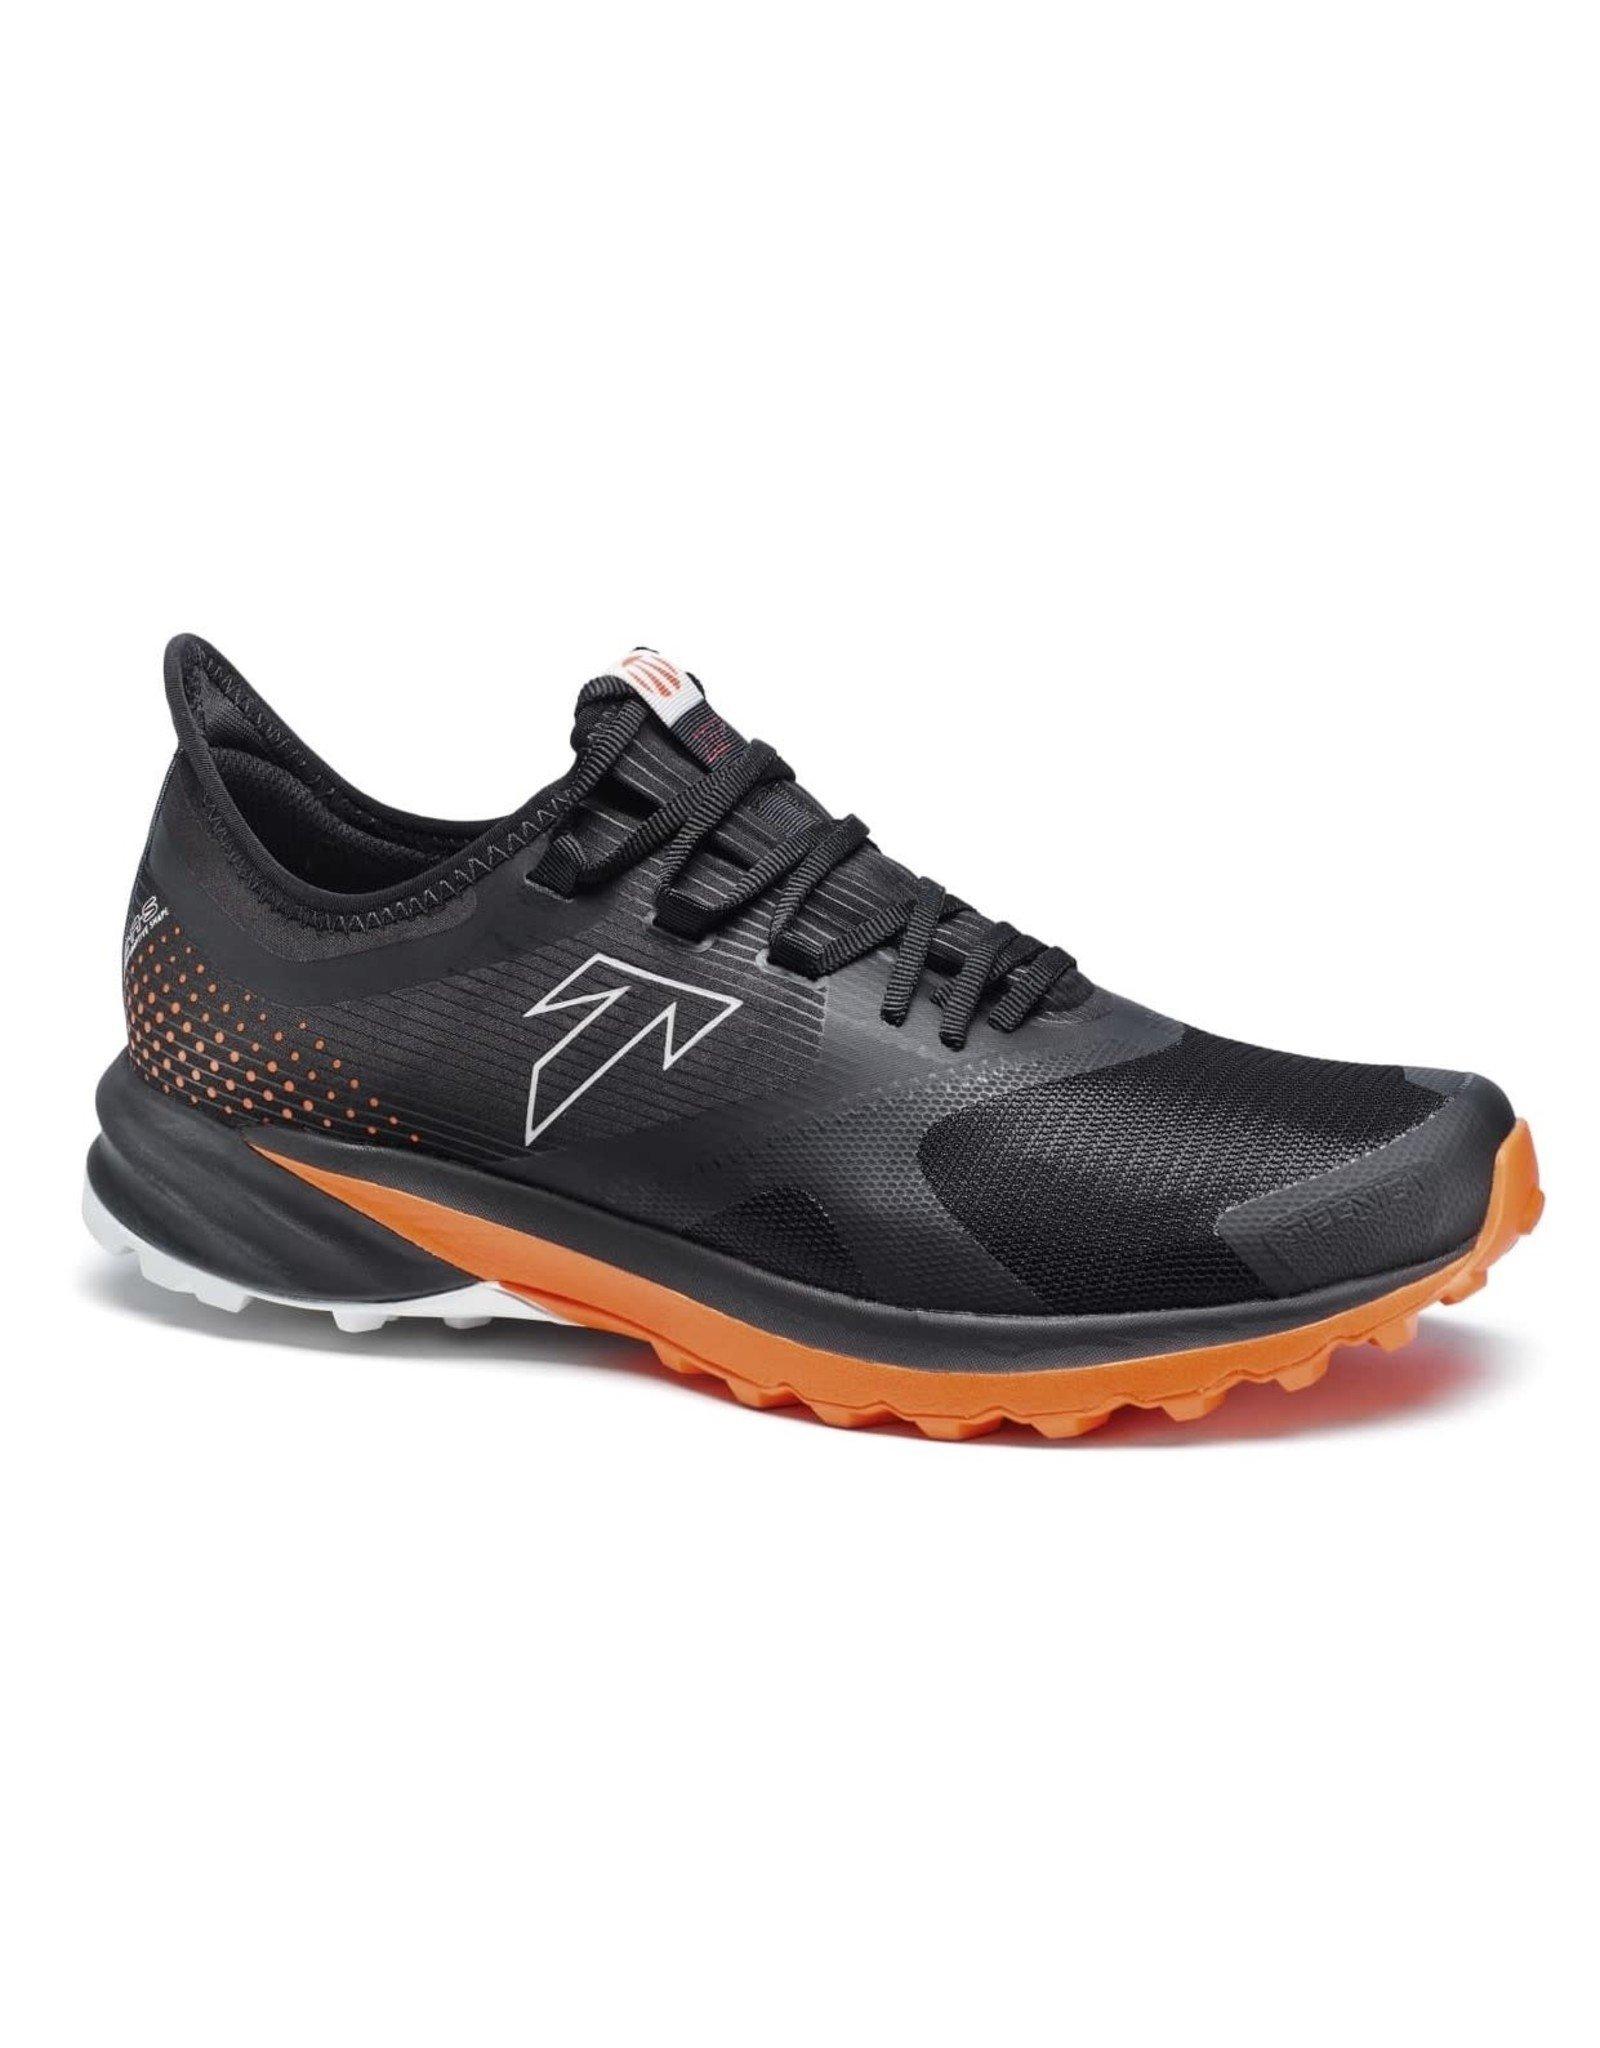 Tecnica Chaussure de course Tecnica Origin XT  - Hommes